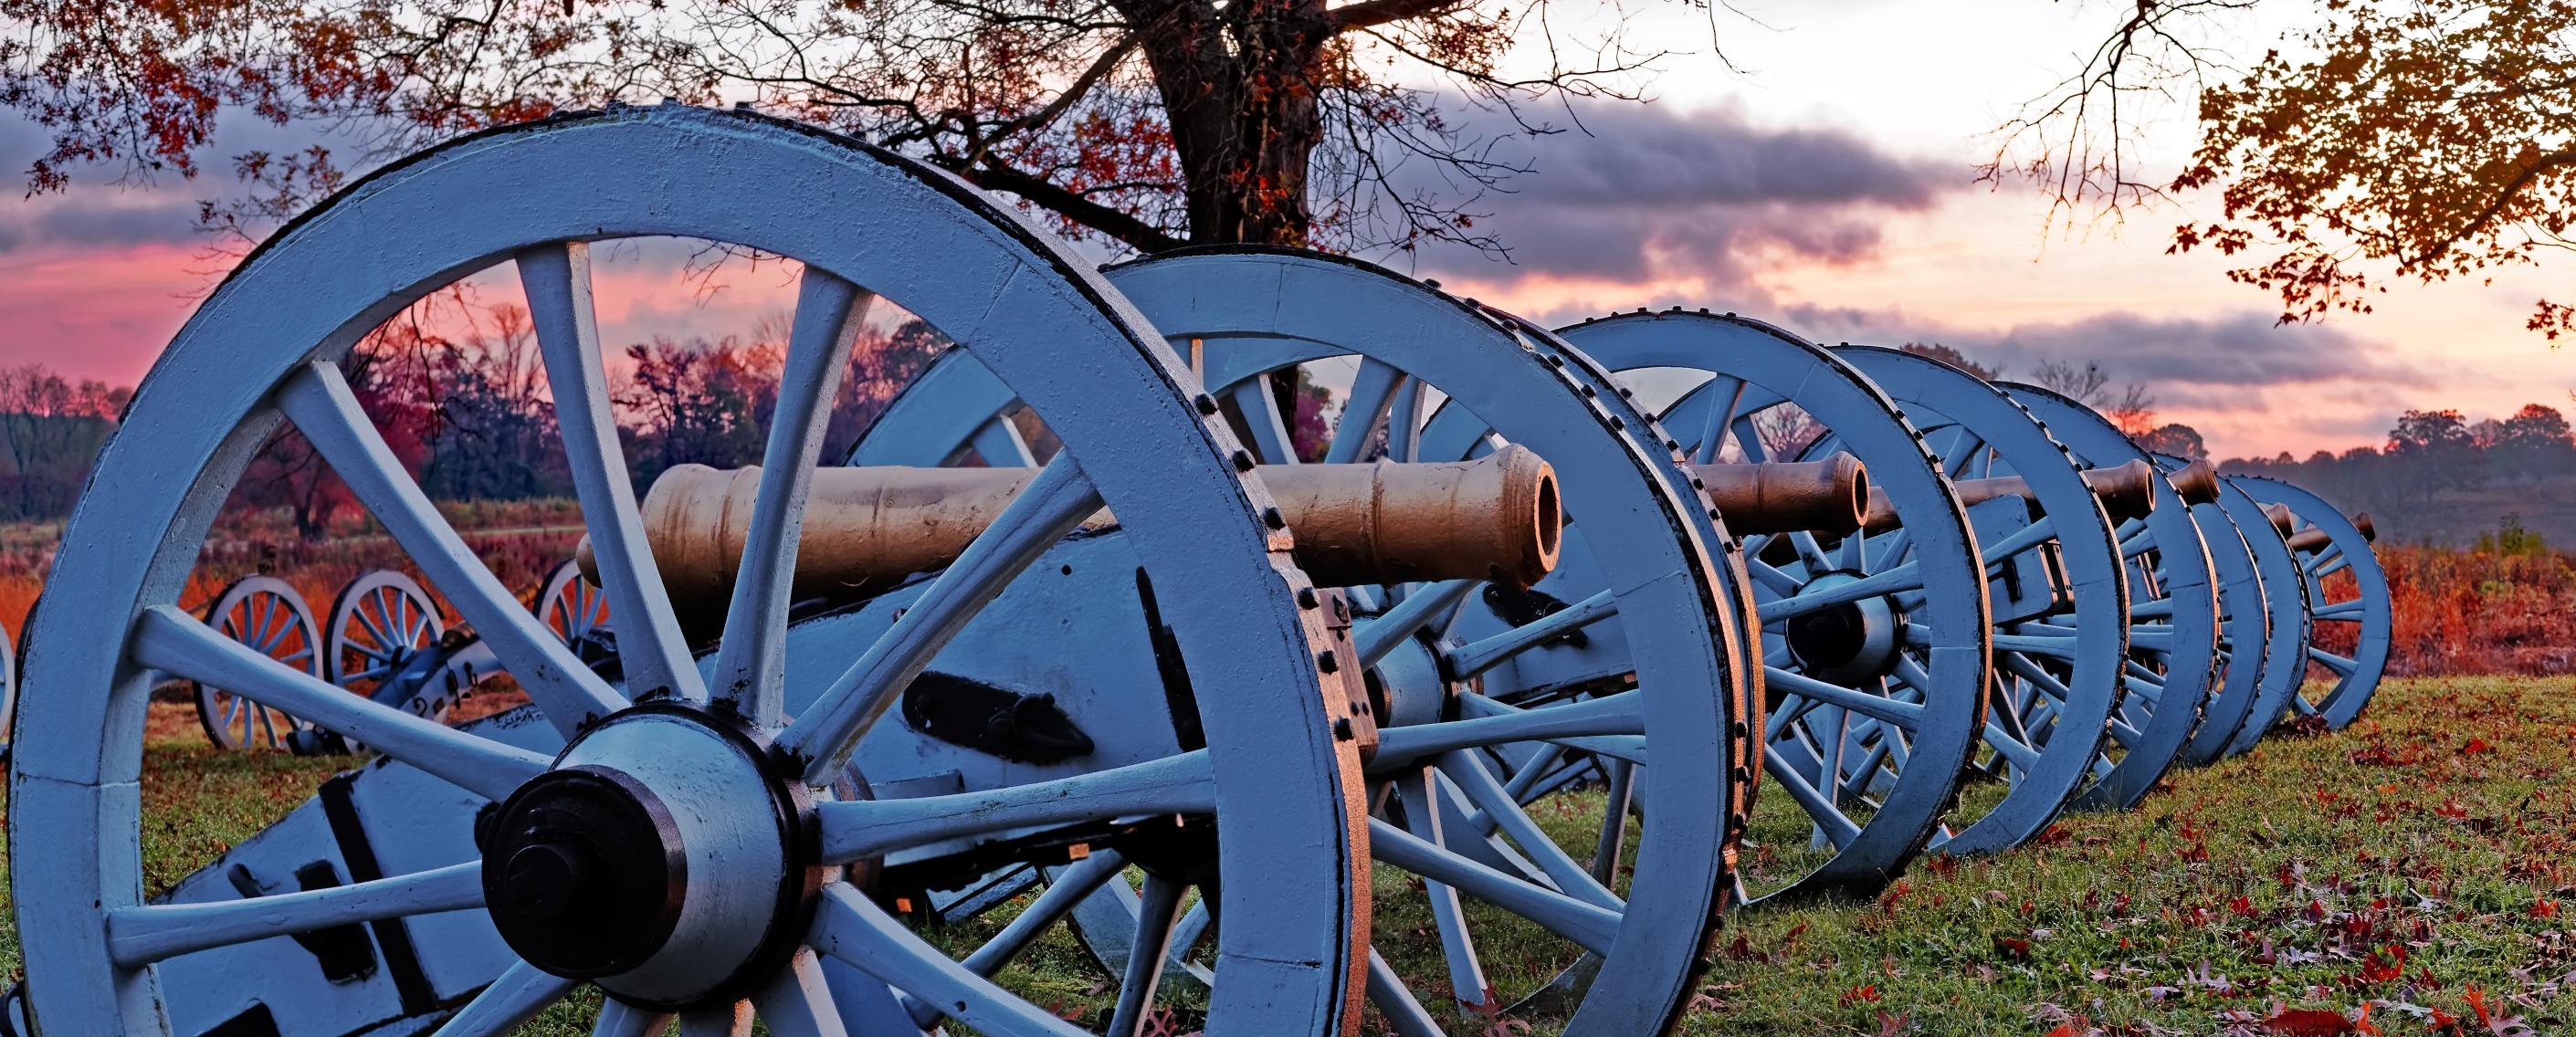 King of Prussia Pennsylvania wheel